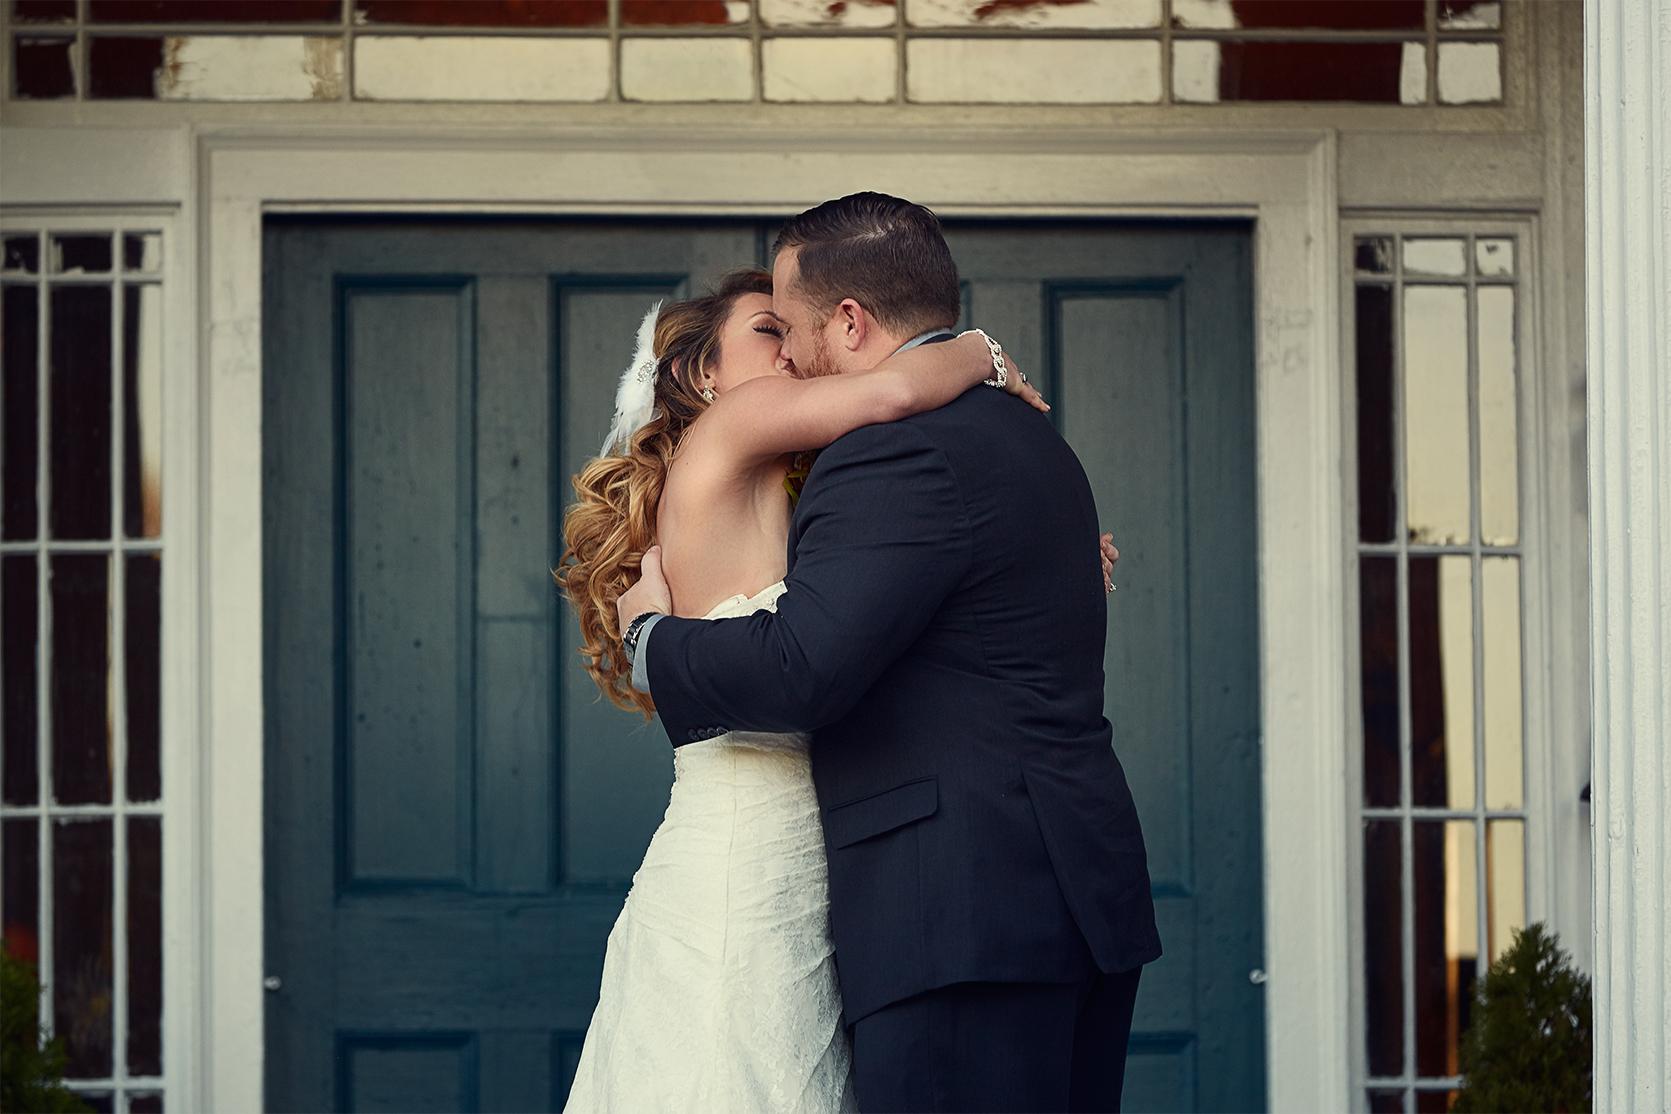 _RNE5418Tina-And-Miles-Wedding_N,2015_Raleigh_NC_ErnestoSue381.jpeg